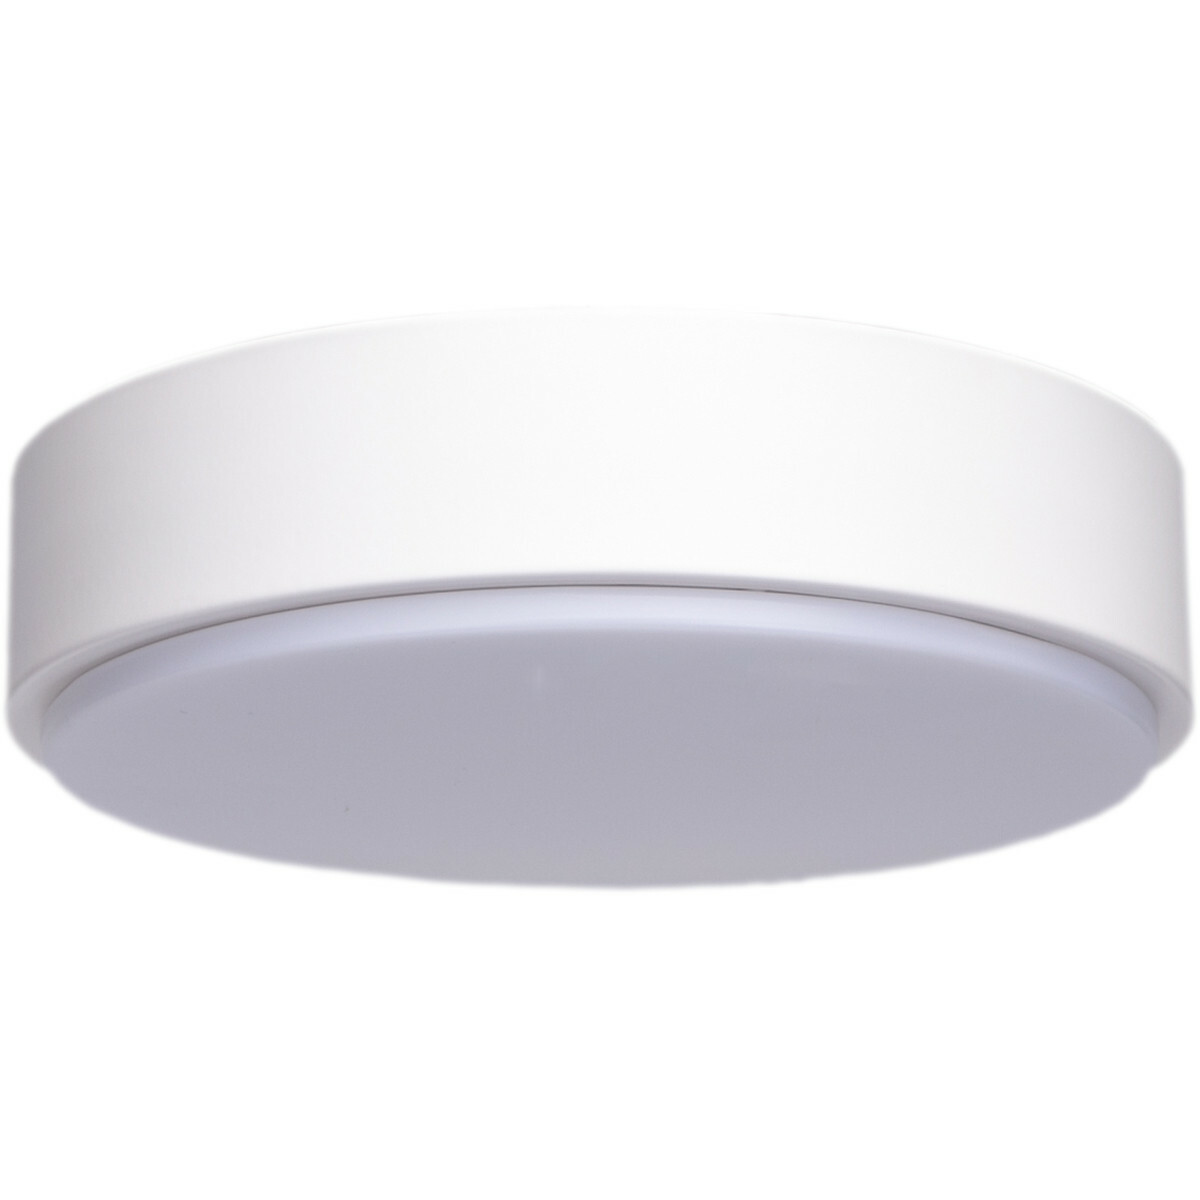 LED Plafondlamp - Aigi Santi - Opbouw Rond 24W - Helder/Koud Wit 6500K - Mat Wit - Aluminium